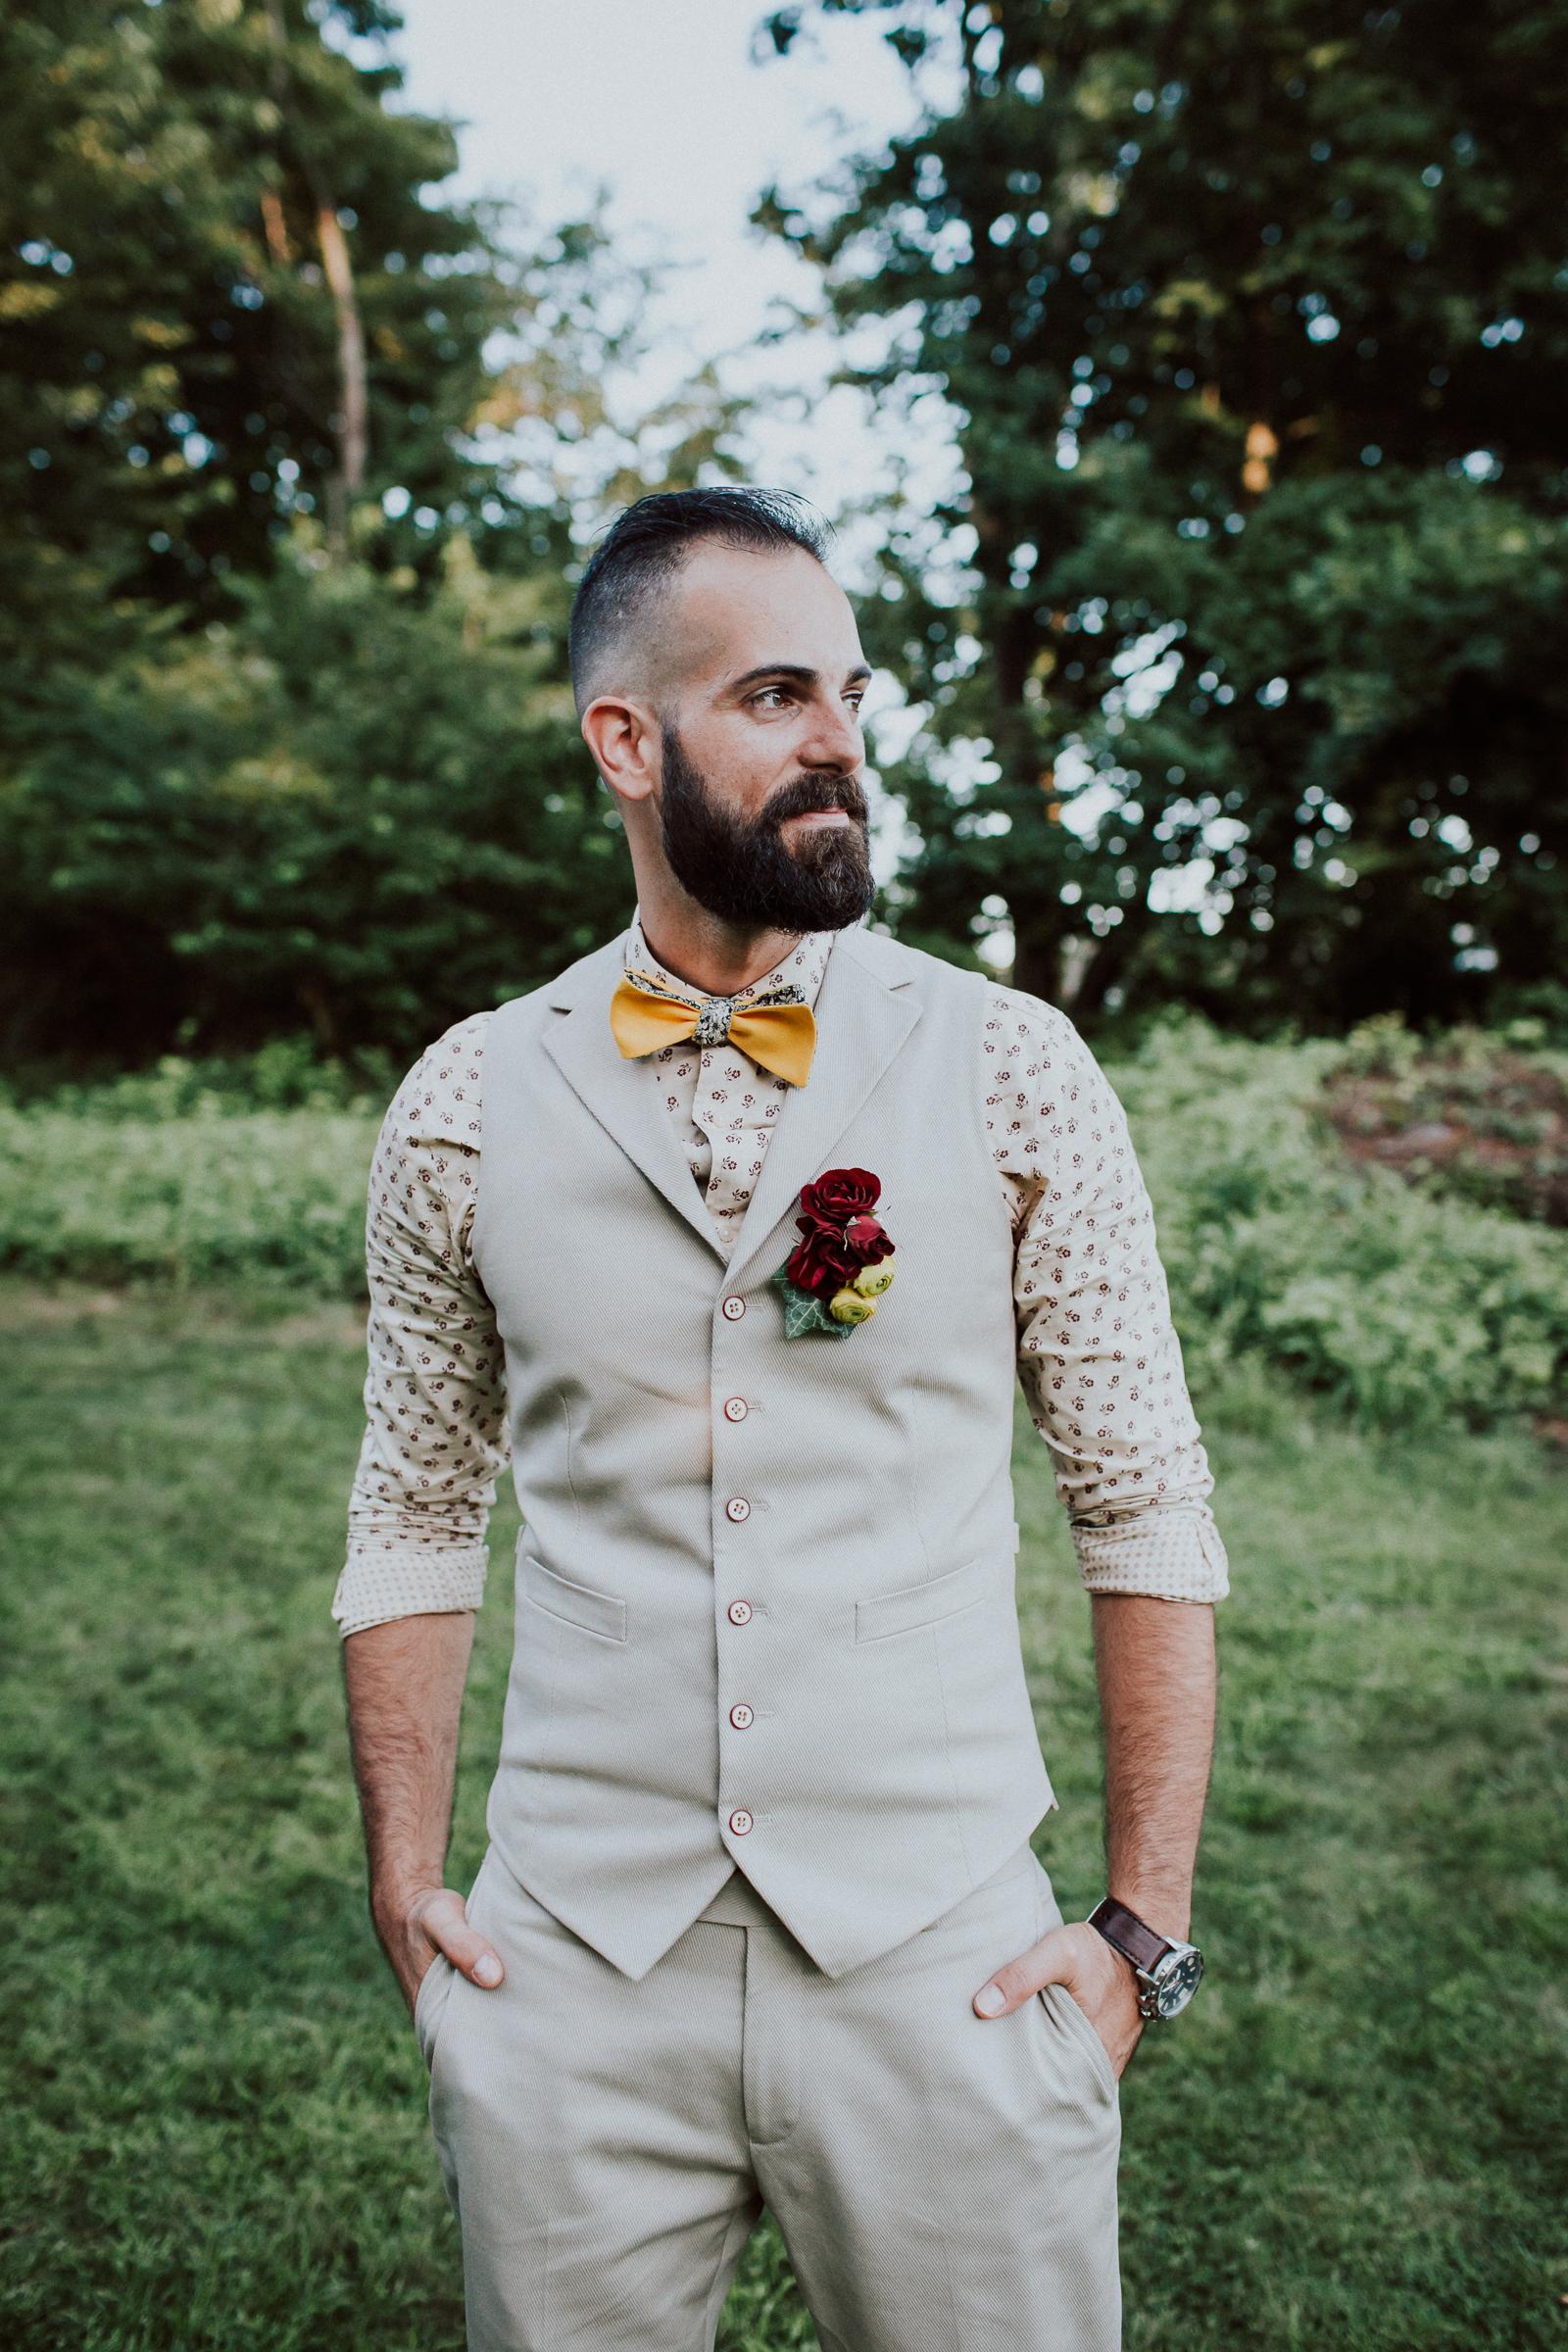 Backyard-Intimate-Adventurous-Destination-Wedding-Darien-Connecticut-Documentary-Wedding-Photography-97.jpg